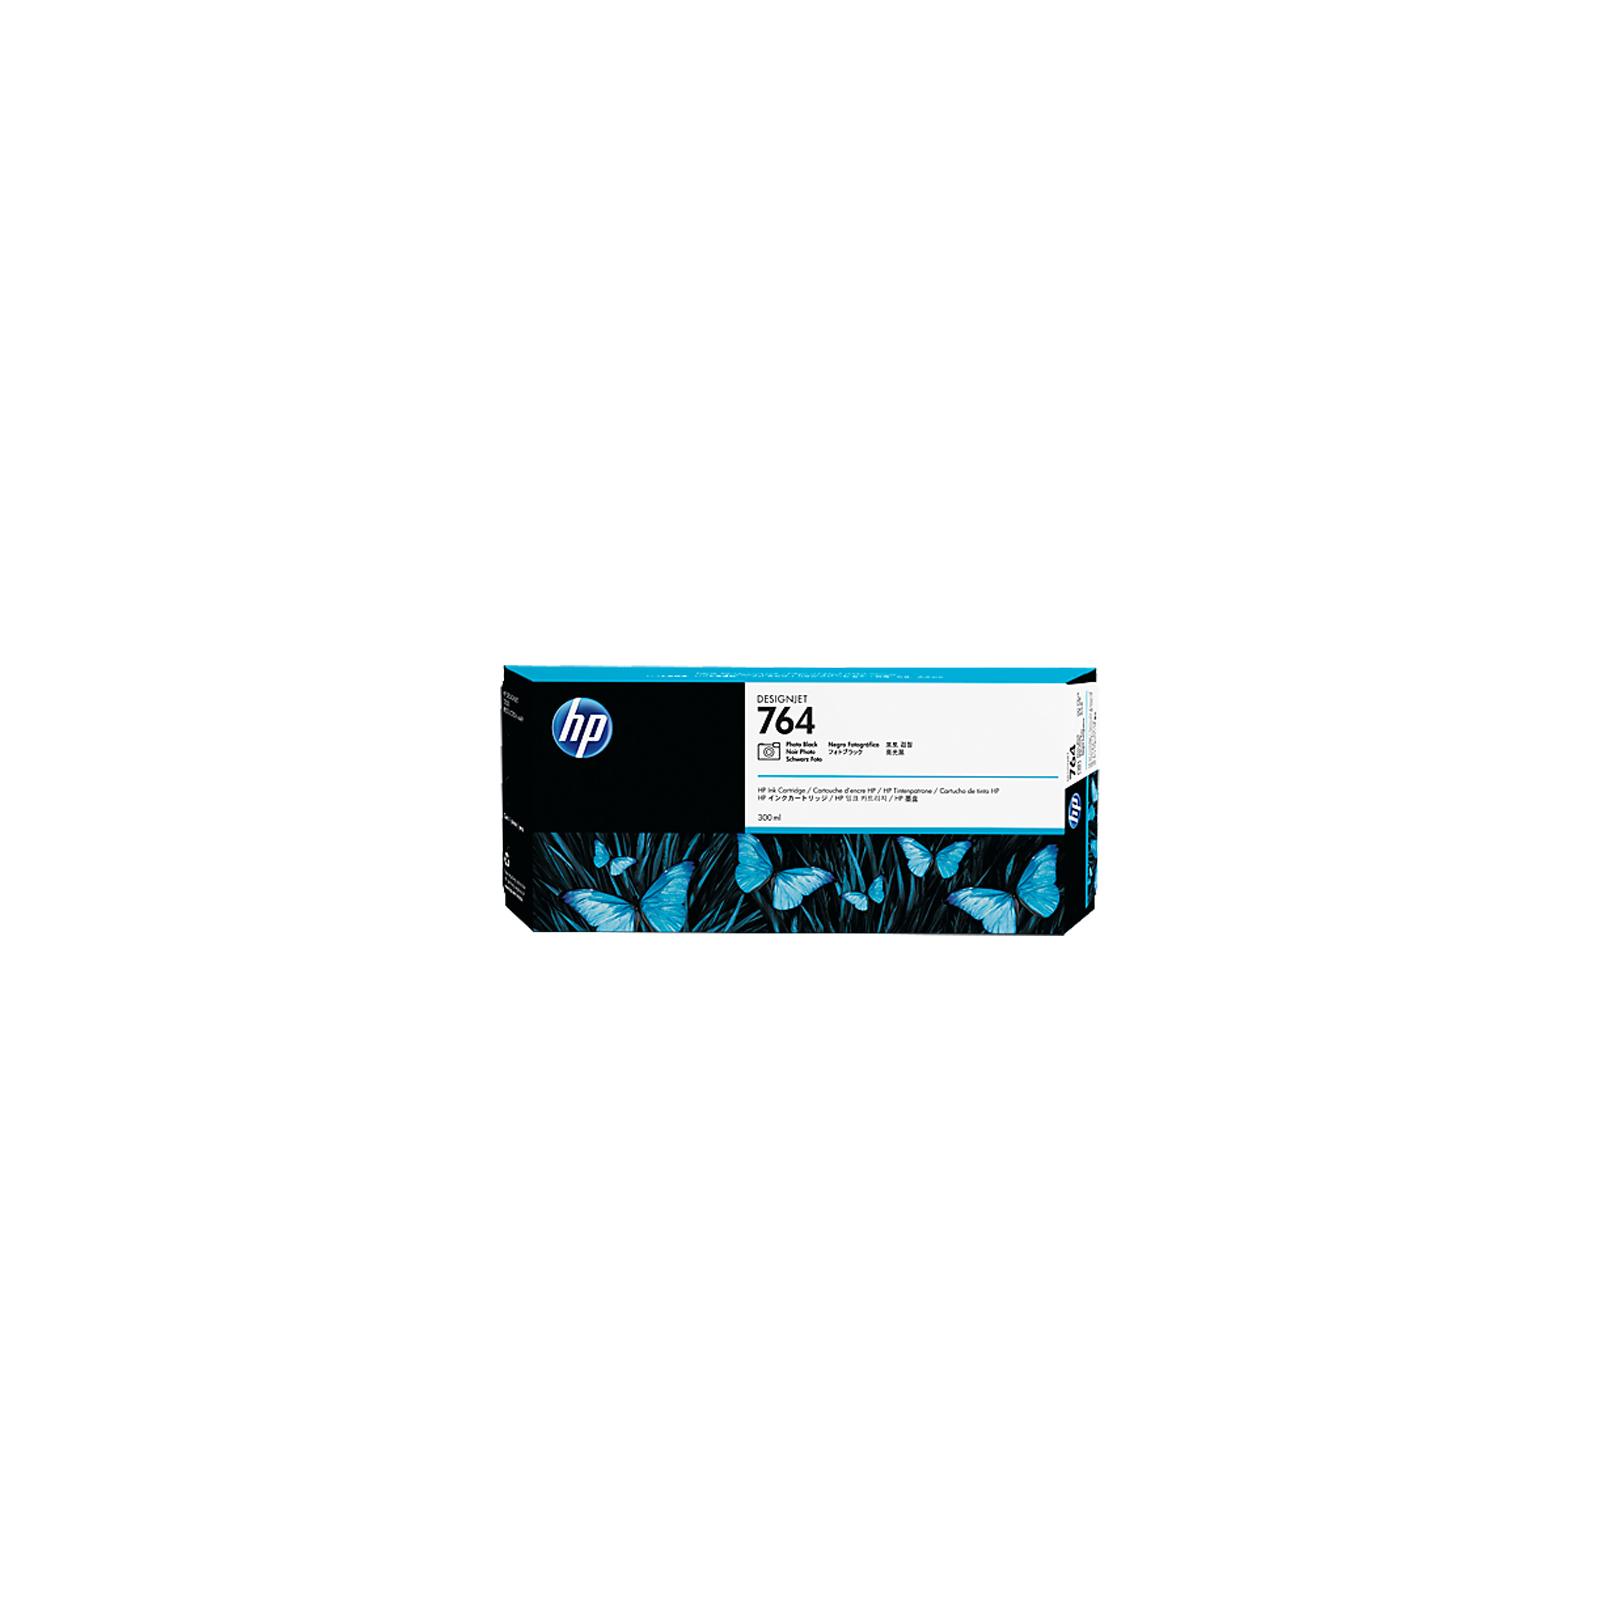 Картридж HP DJ No.764 Photo Black DesignJet Ink Cartridge (C1Q17A)